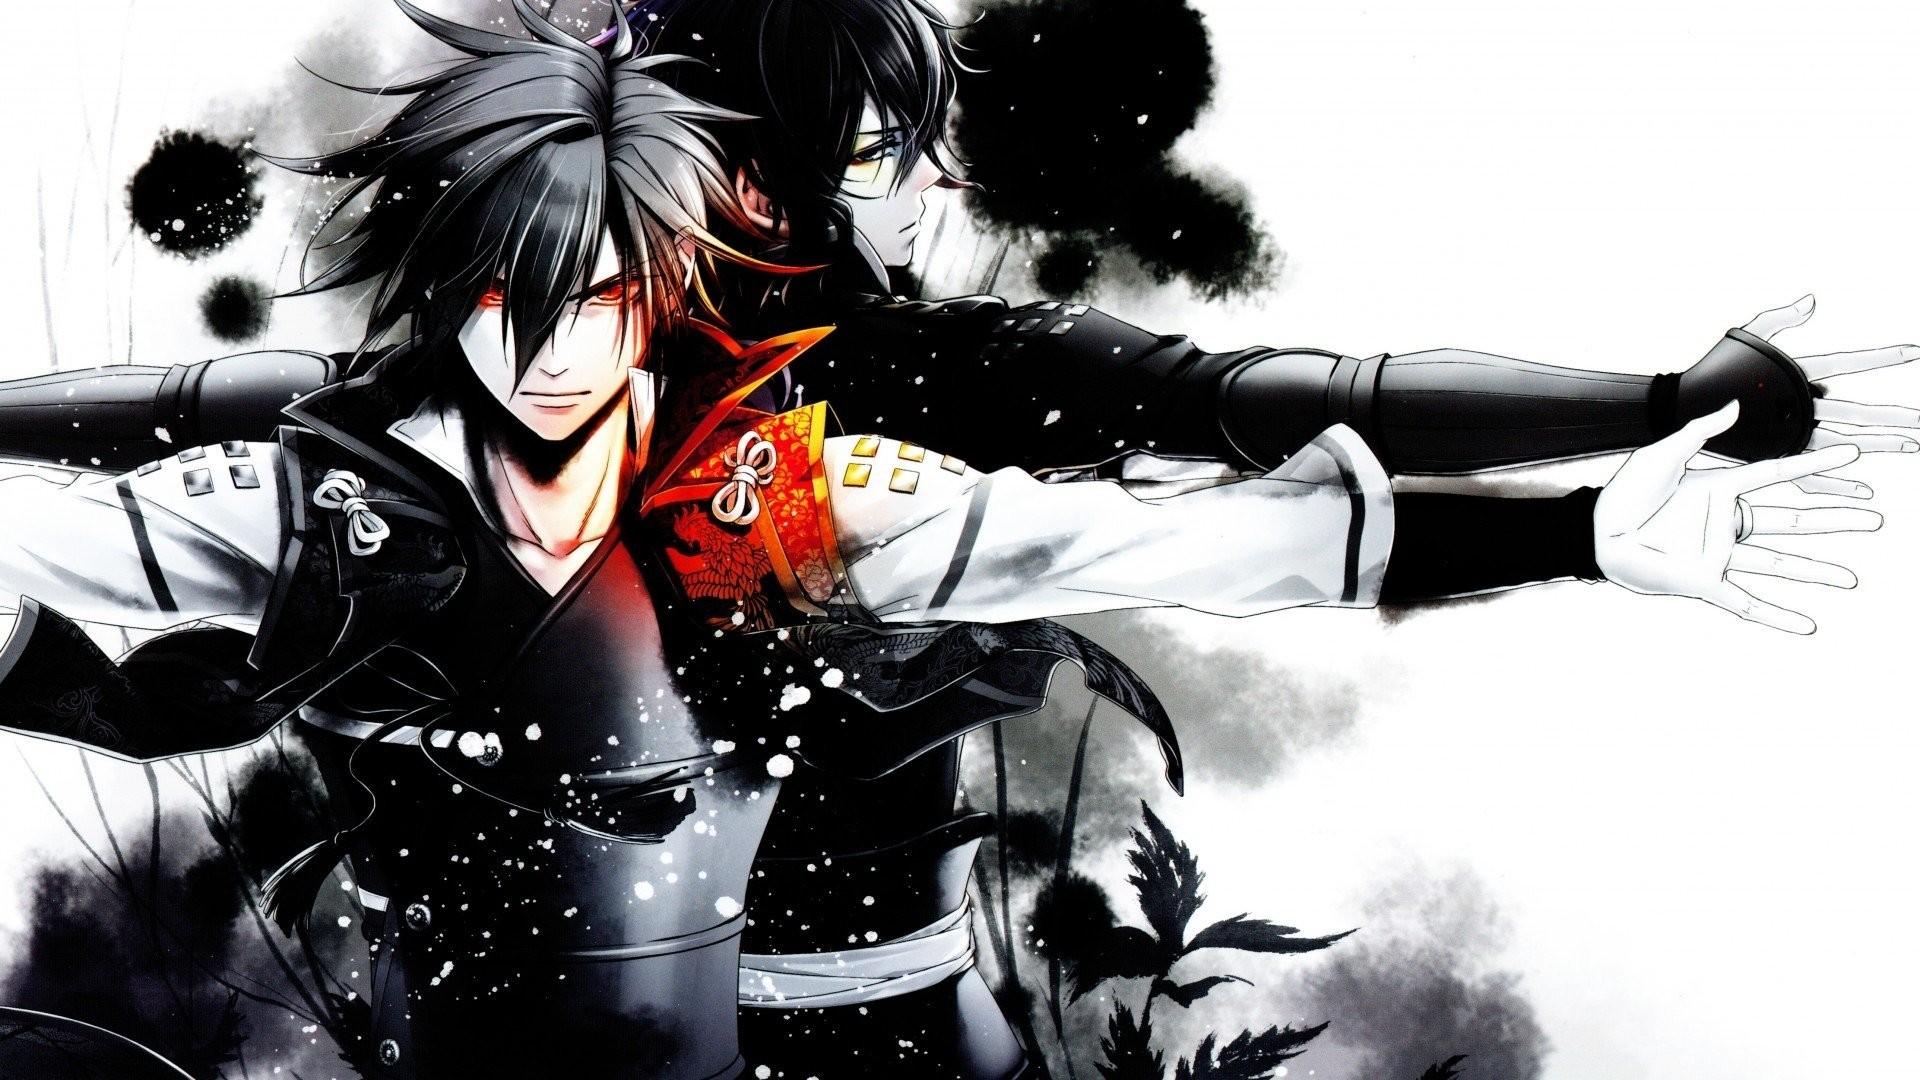 Anime Boy Wallpaper 66 Images